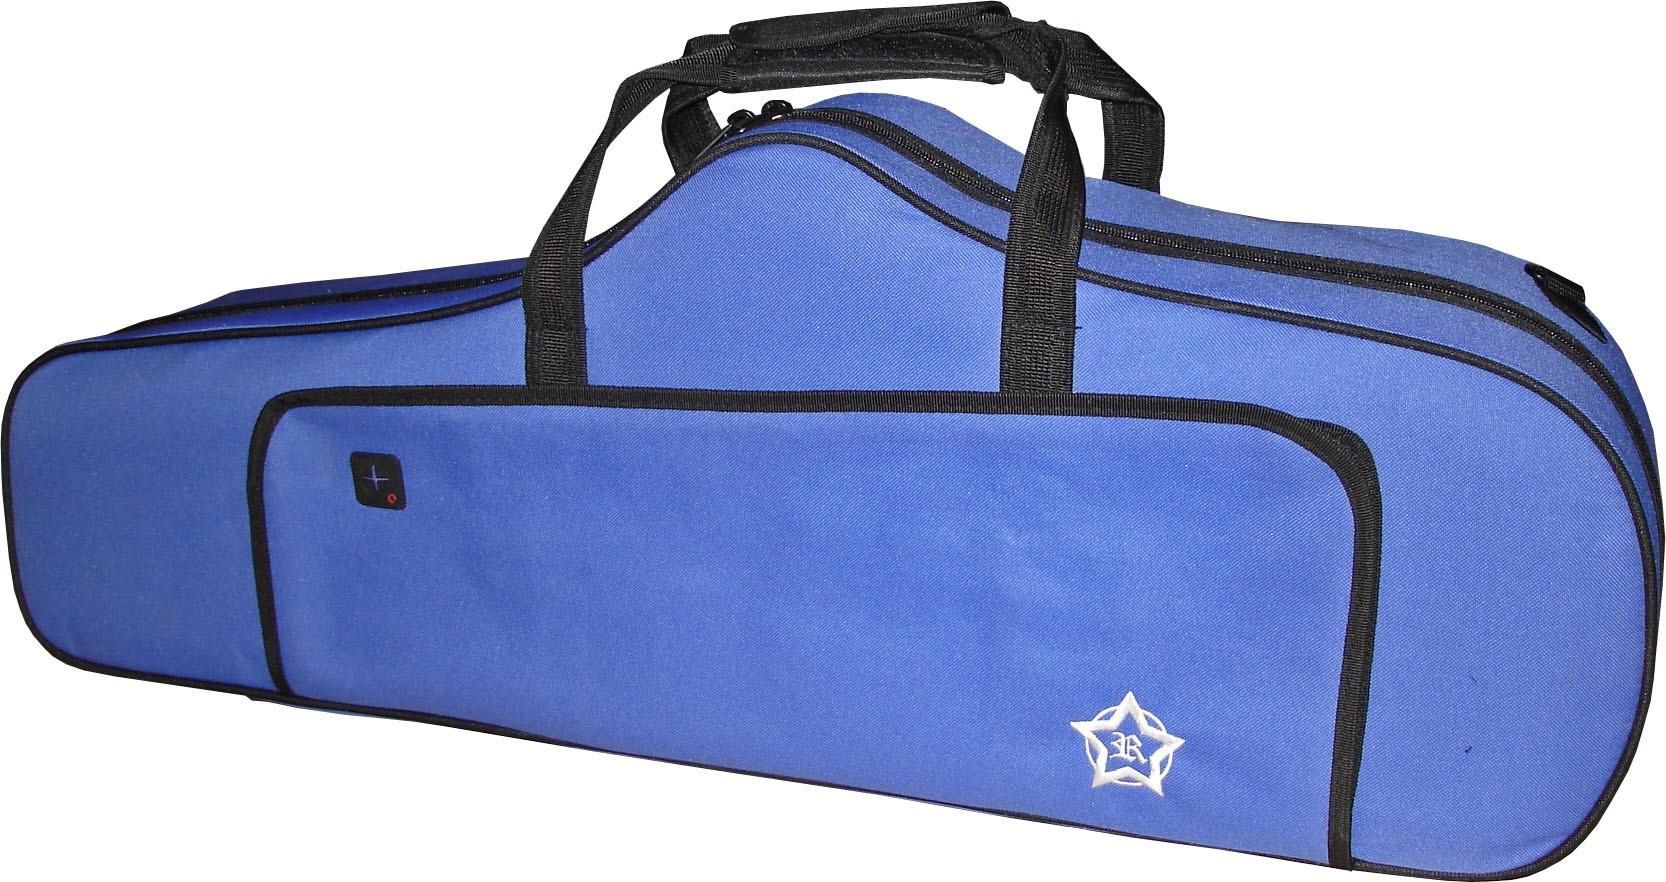 Rosetti Tenor Saxophone Bag - Blue